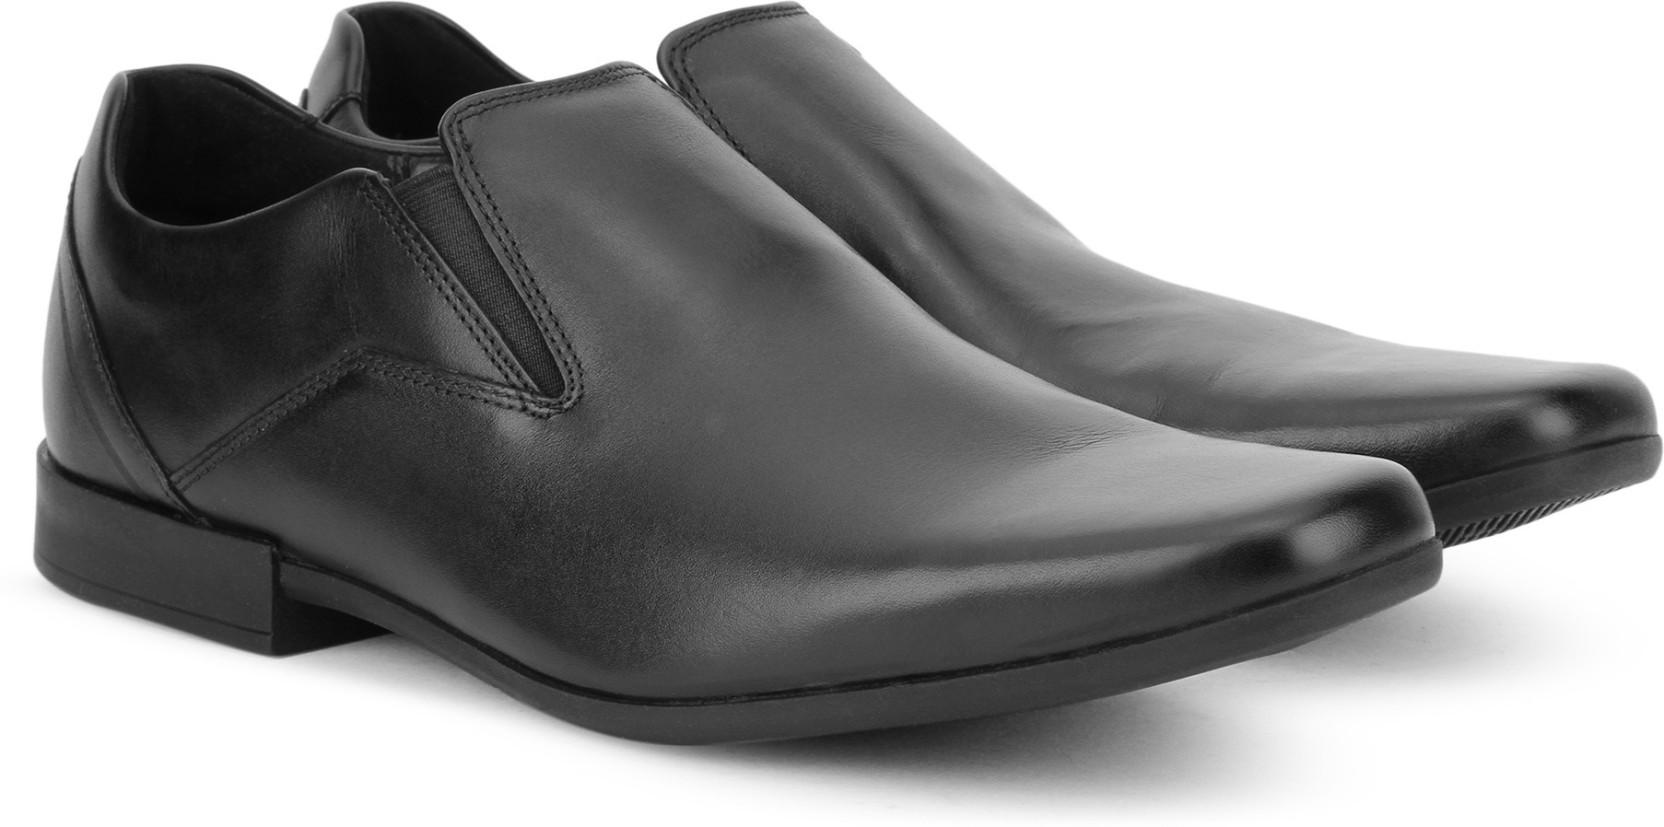 78db0f0897f Clarks Glement Slip Slip On For Men - Buy Black Leather Color Clarks ...